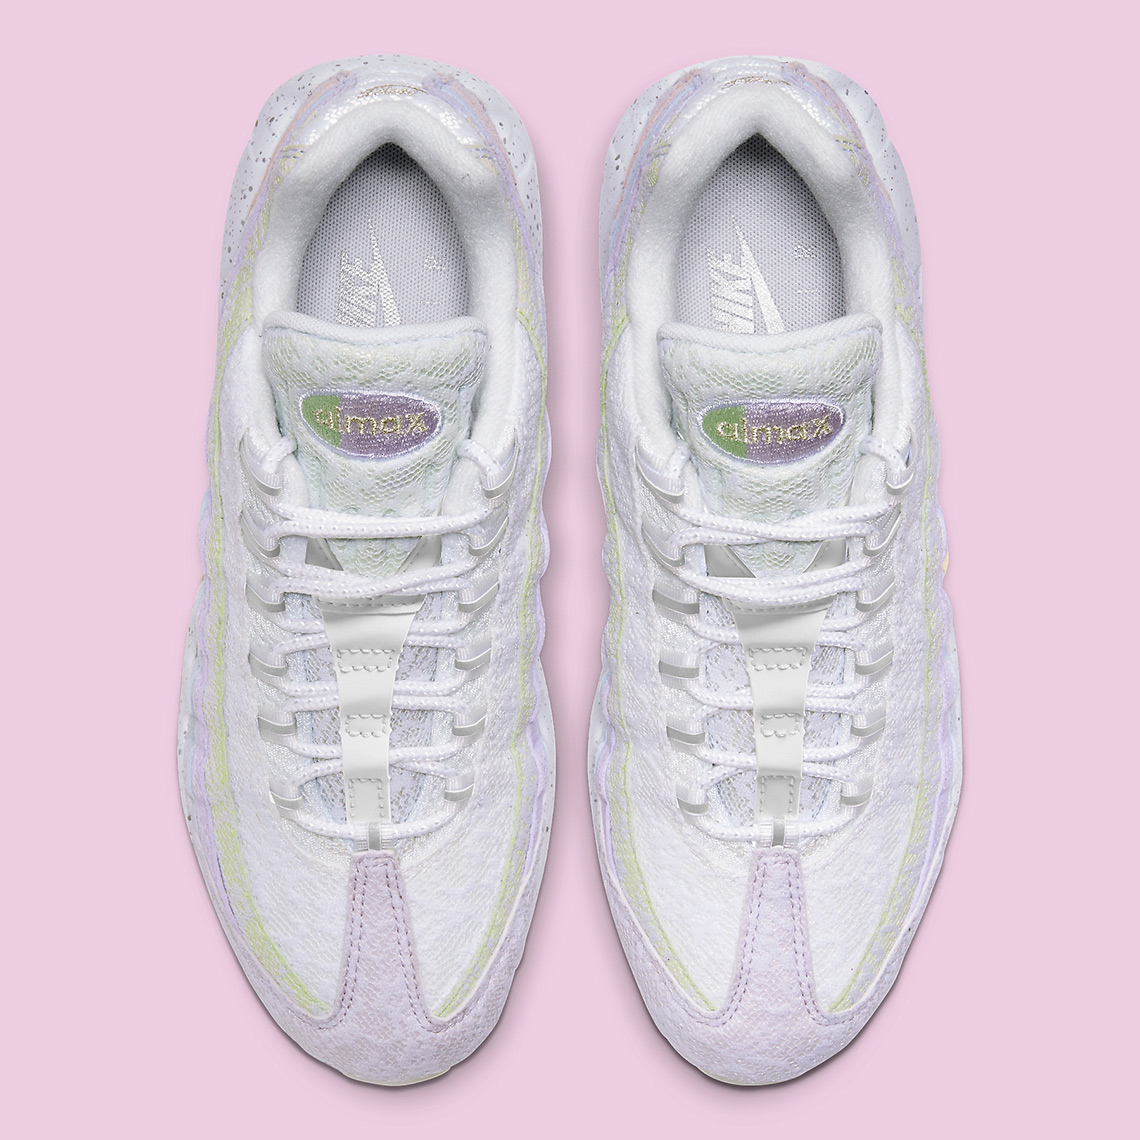 Nike Air Max 95 Floral Lace CU9454-194